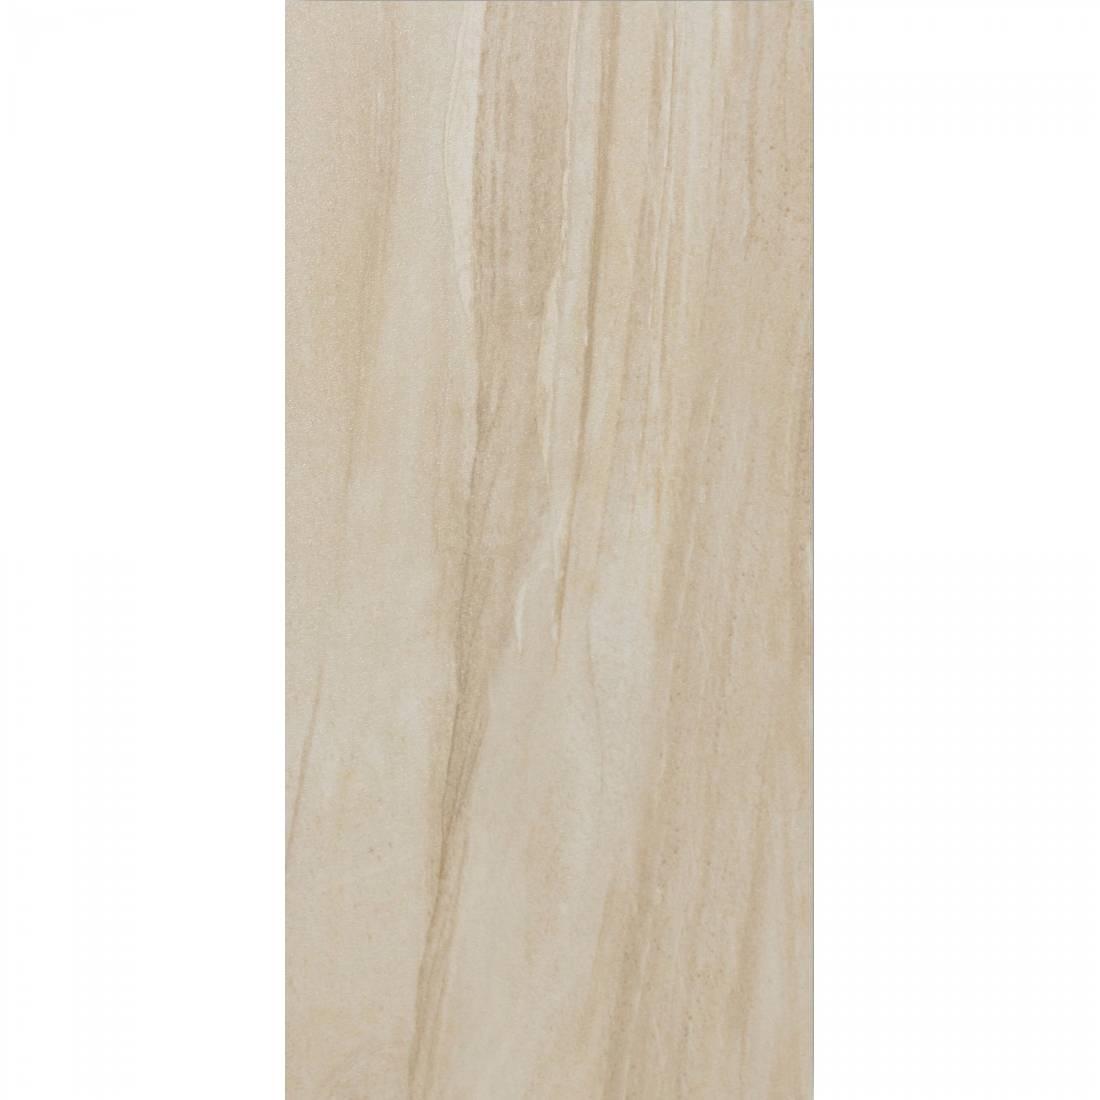 Riverstone Bone 30x60 Ivory 1